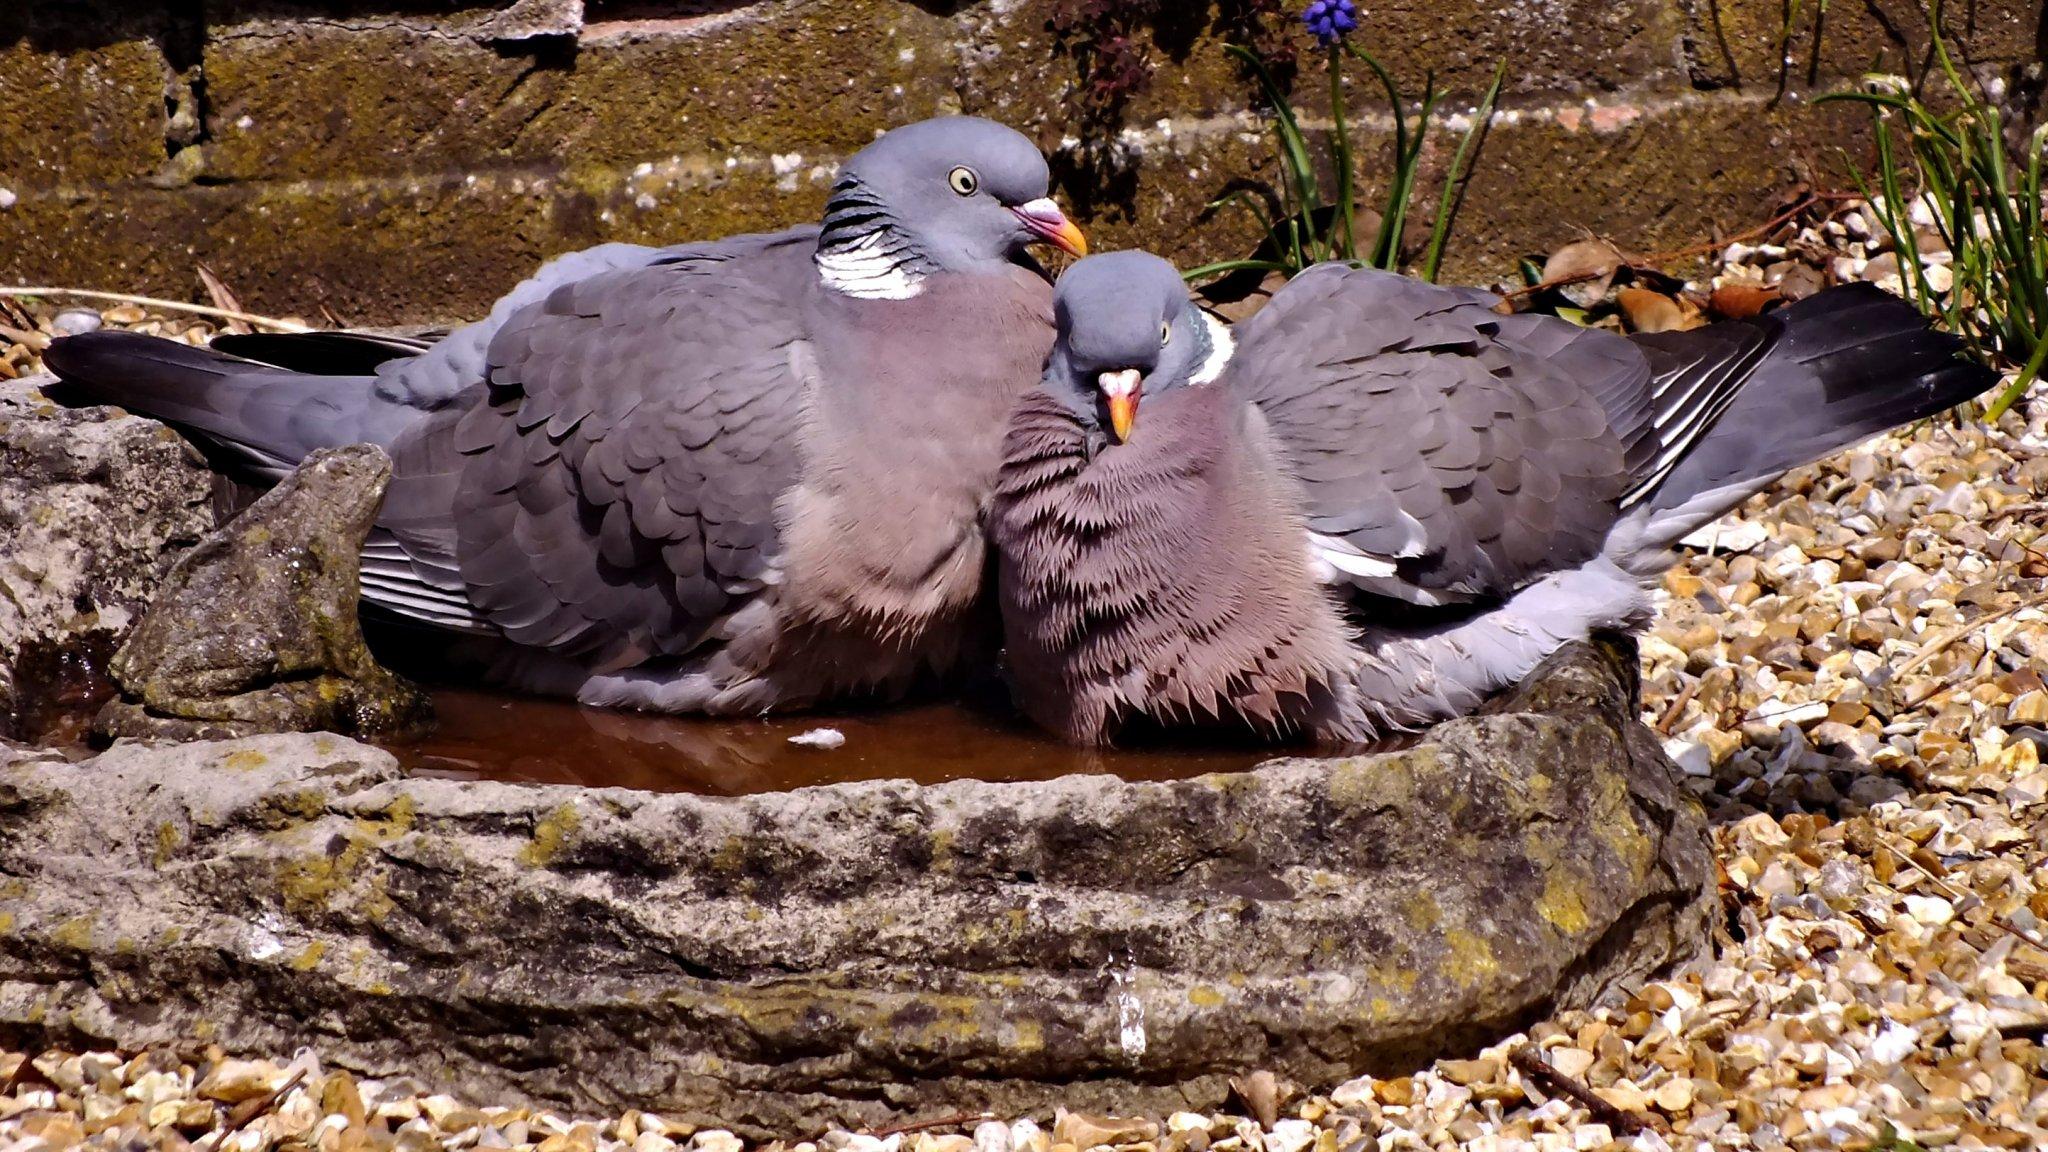 20130425-pigeons-bathing-dscf5080